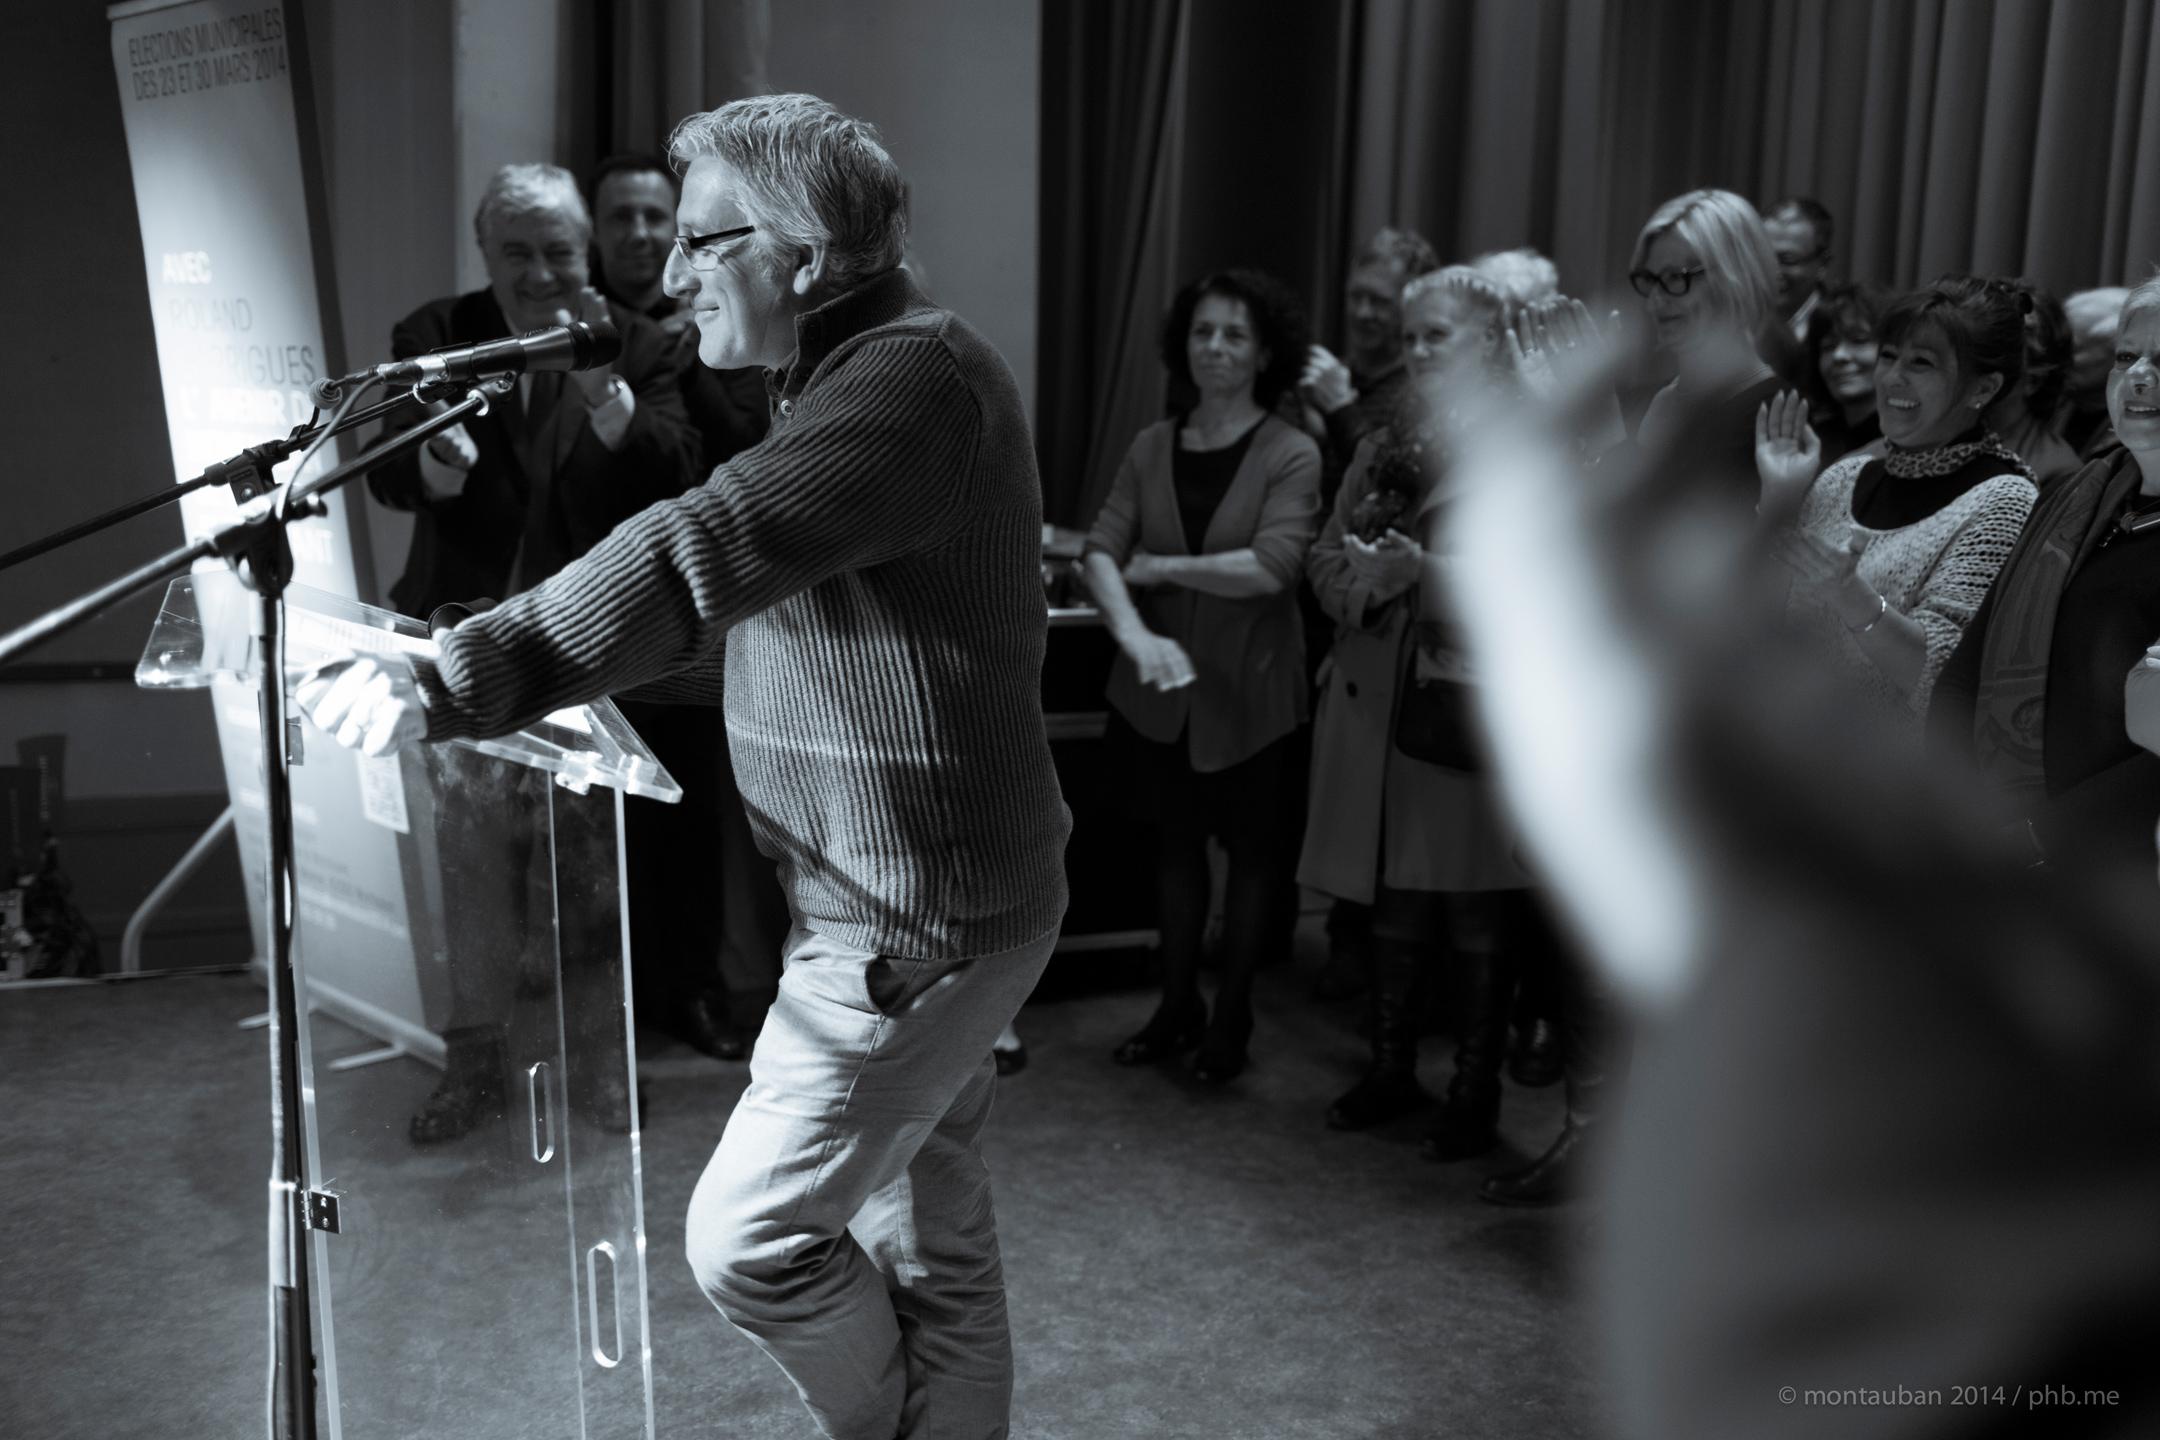 Montauban-2014-Rassemblement-peuple-gauche-vote-IMG_3261